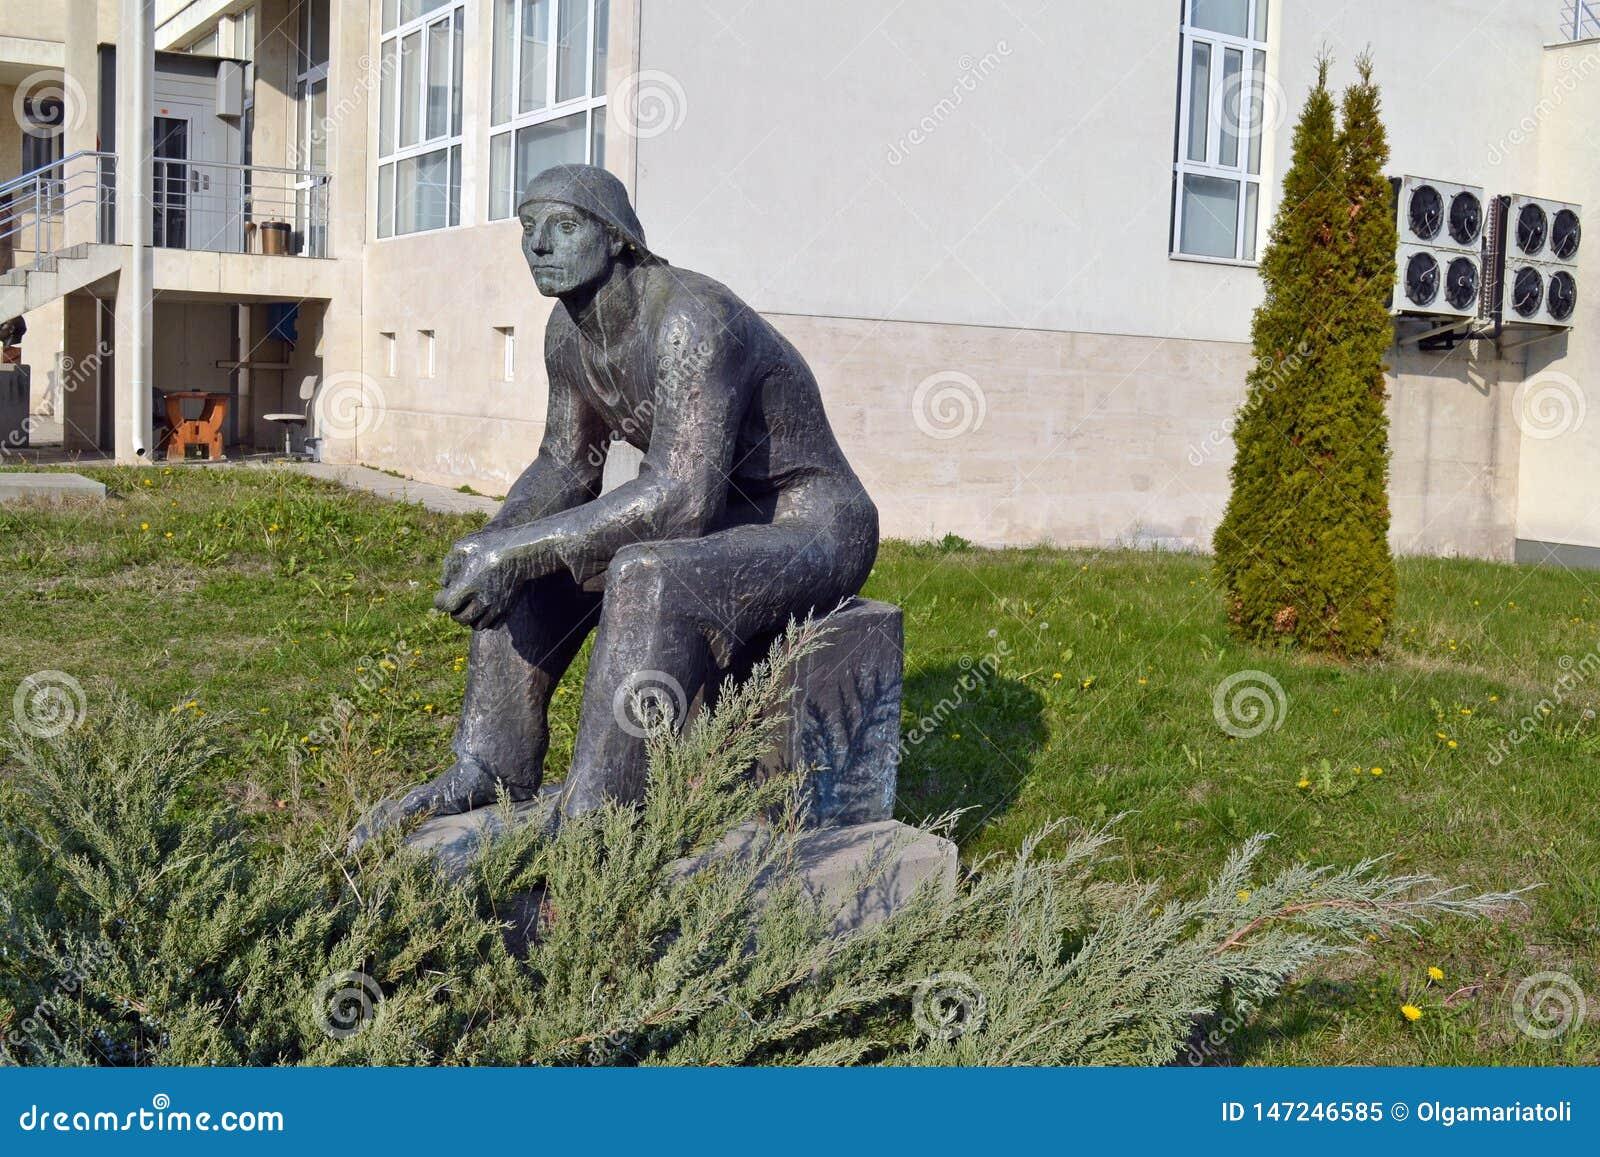 Sofia / Bulgaria - November 2017: Soviet-era statue in the museum of socialist art